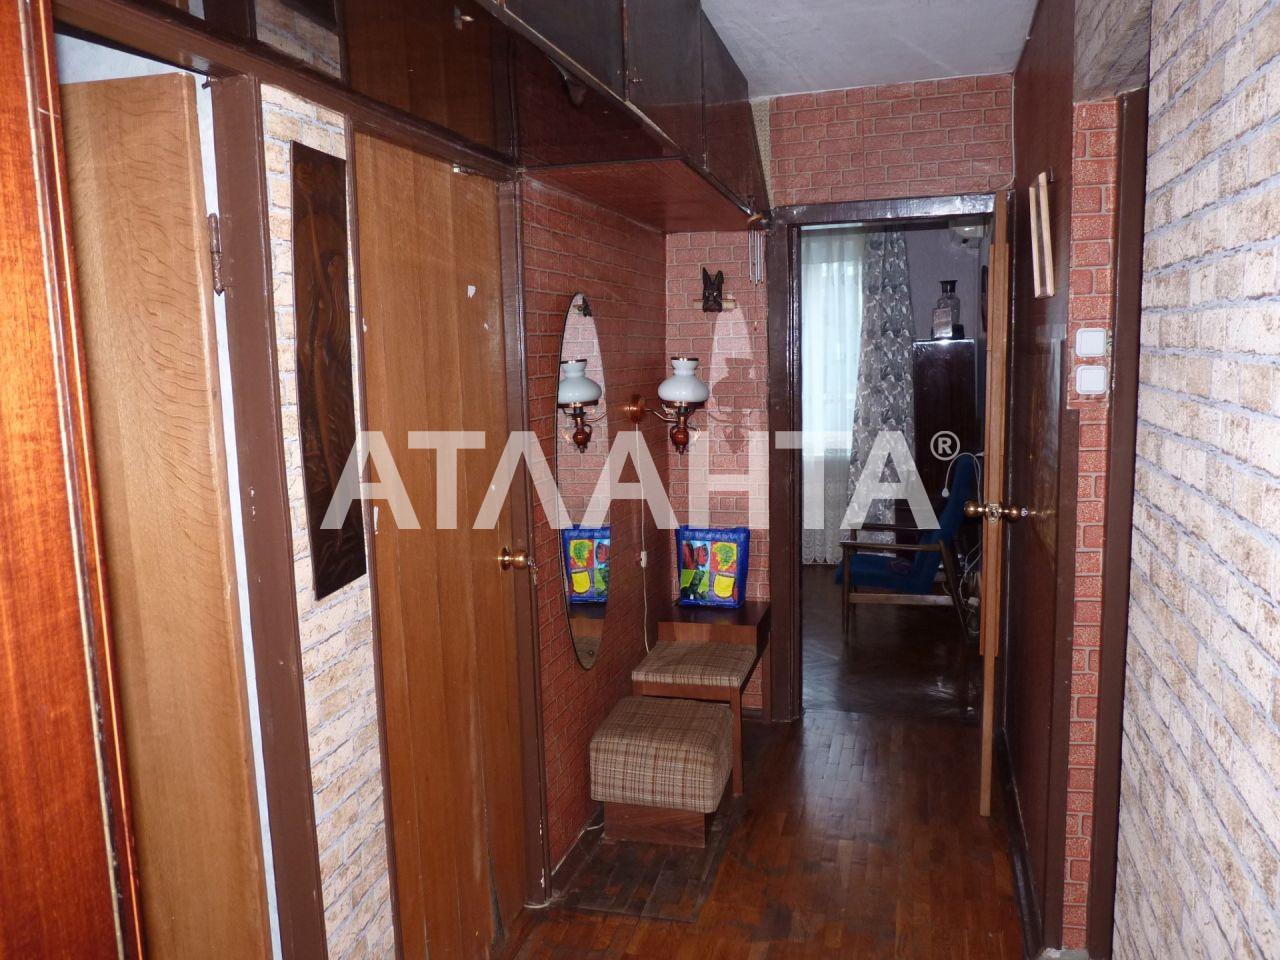 Продается 4-комнатная Квартира на ул. Днепровская Наб. — 65 000 у.е. (фото №5)